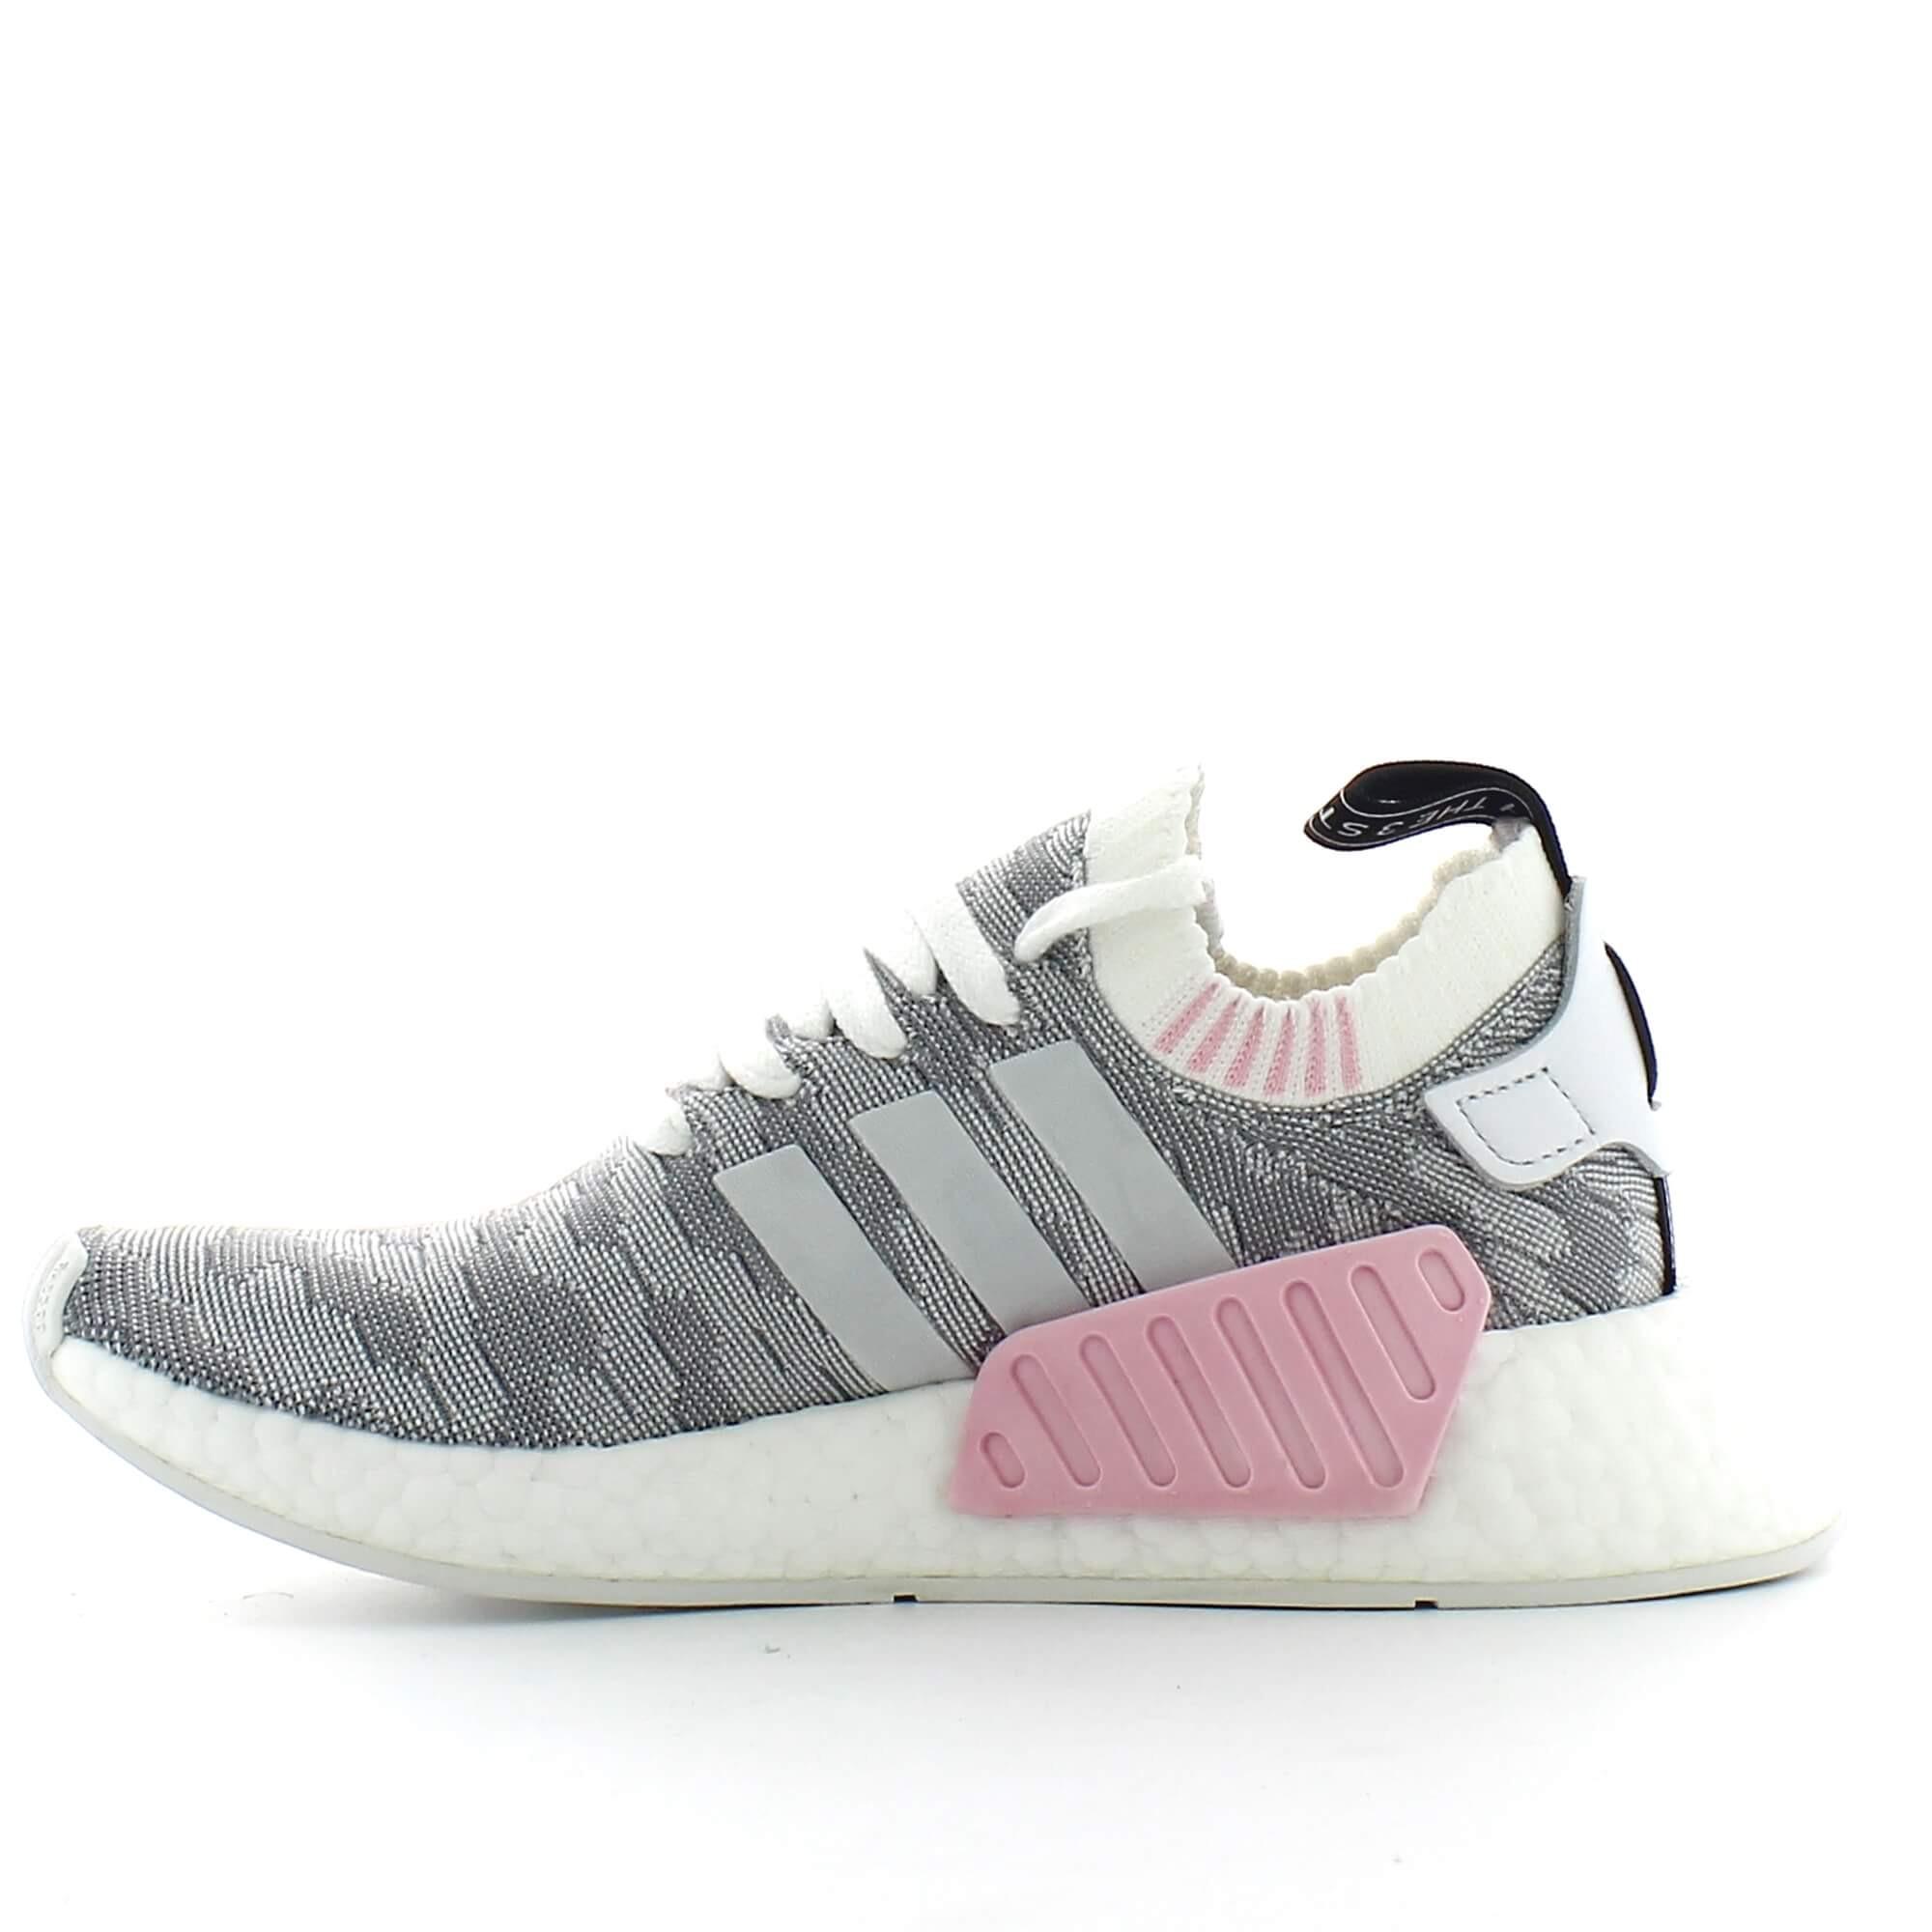 Zapatillas adidas Nmd_R2 Primeknit gris mujer